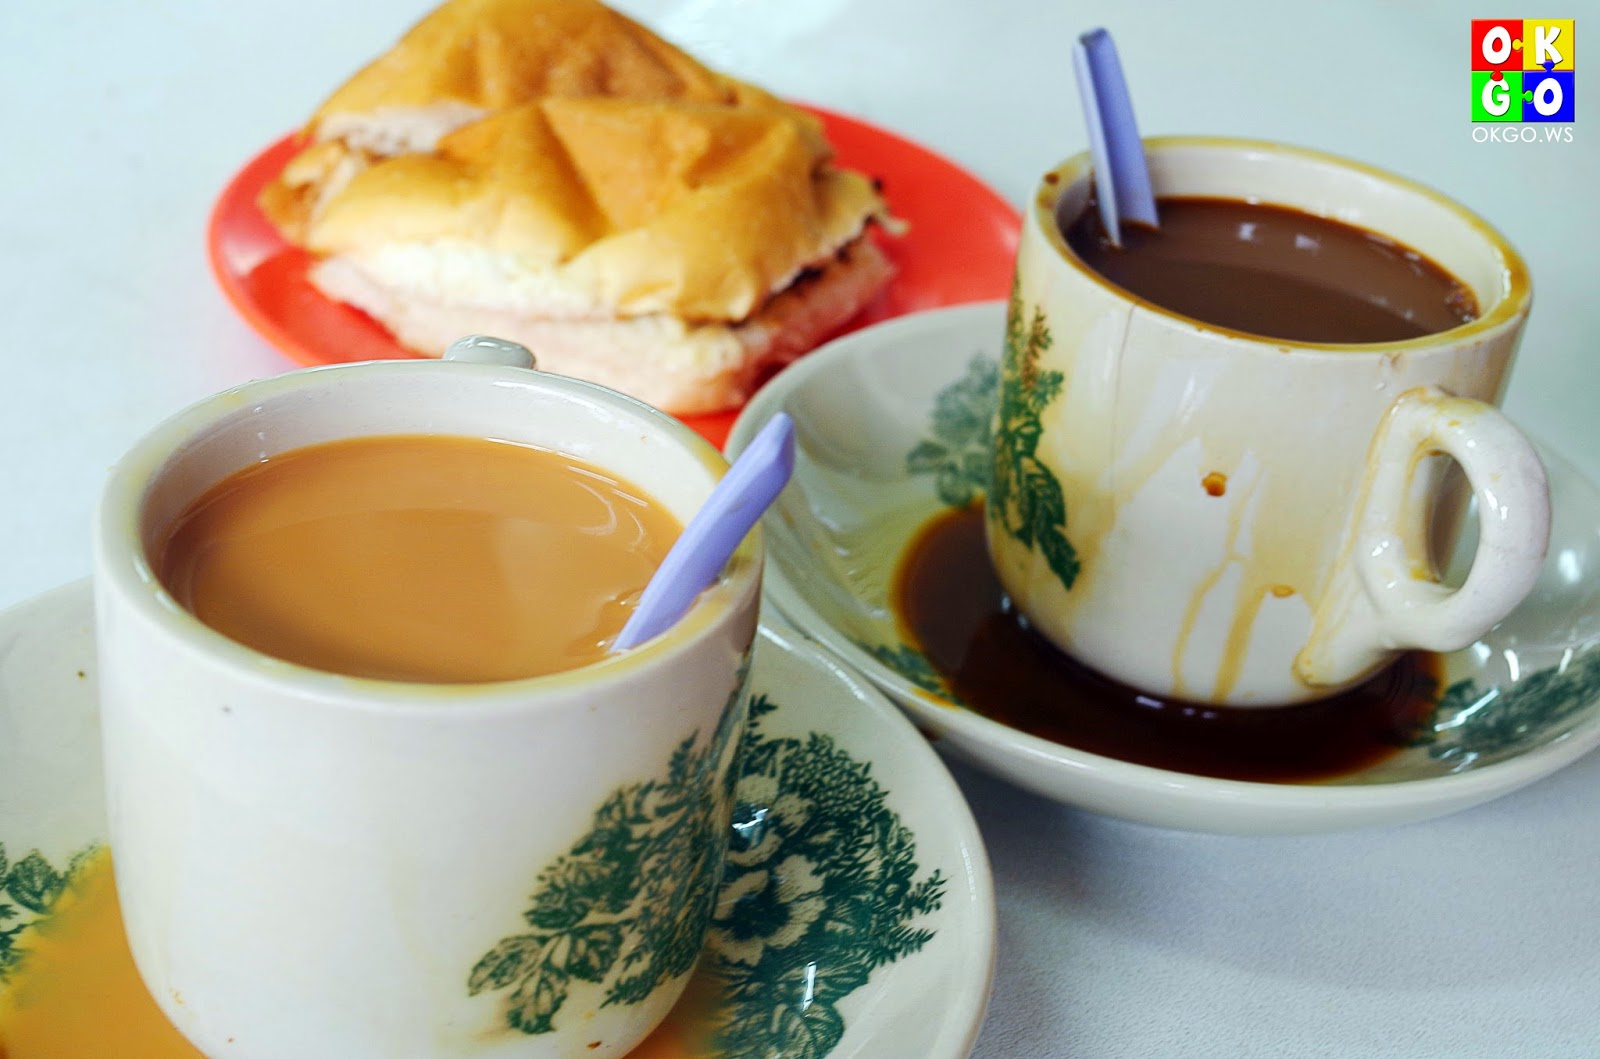 Tan Hiok Nee Kin Hua breakfast